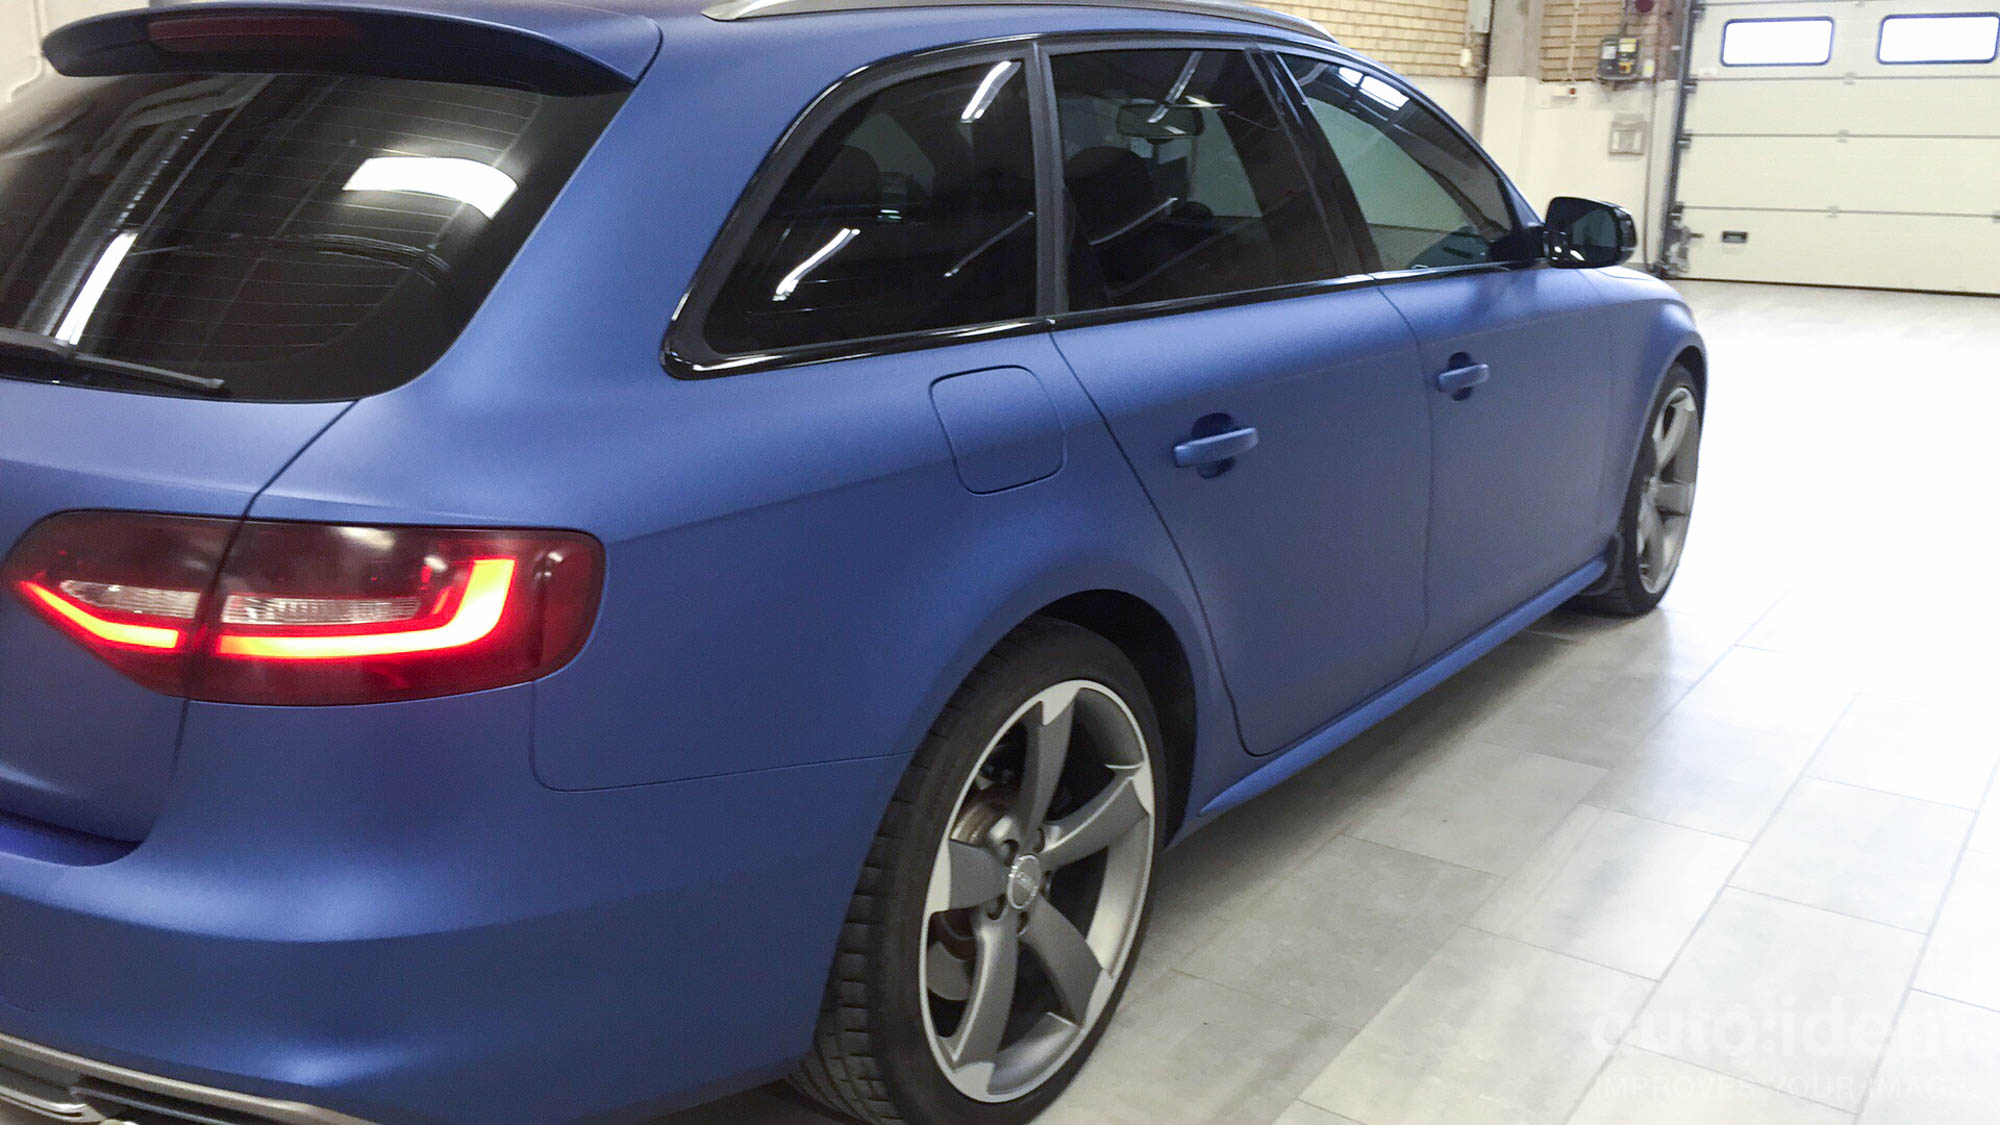 Audi A4 Matte Metallic Slate Blue Back Auto Ident